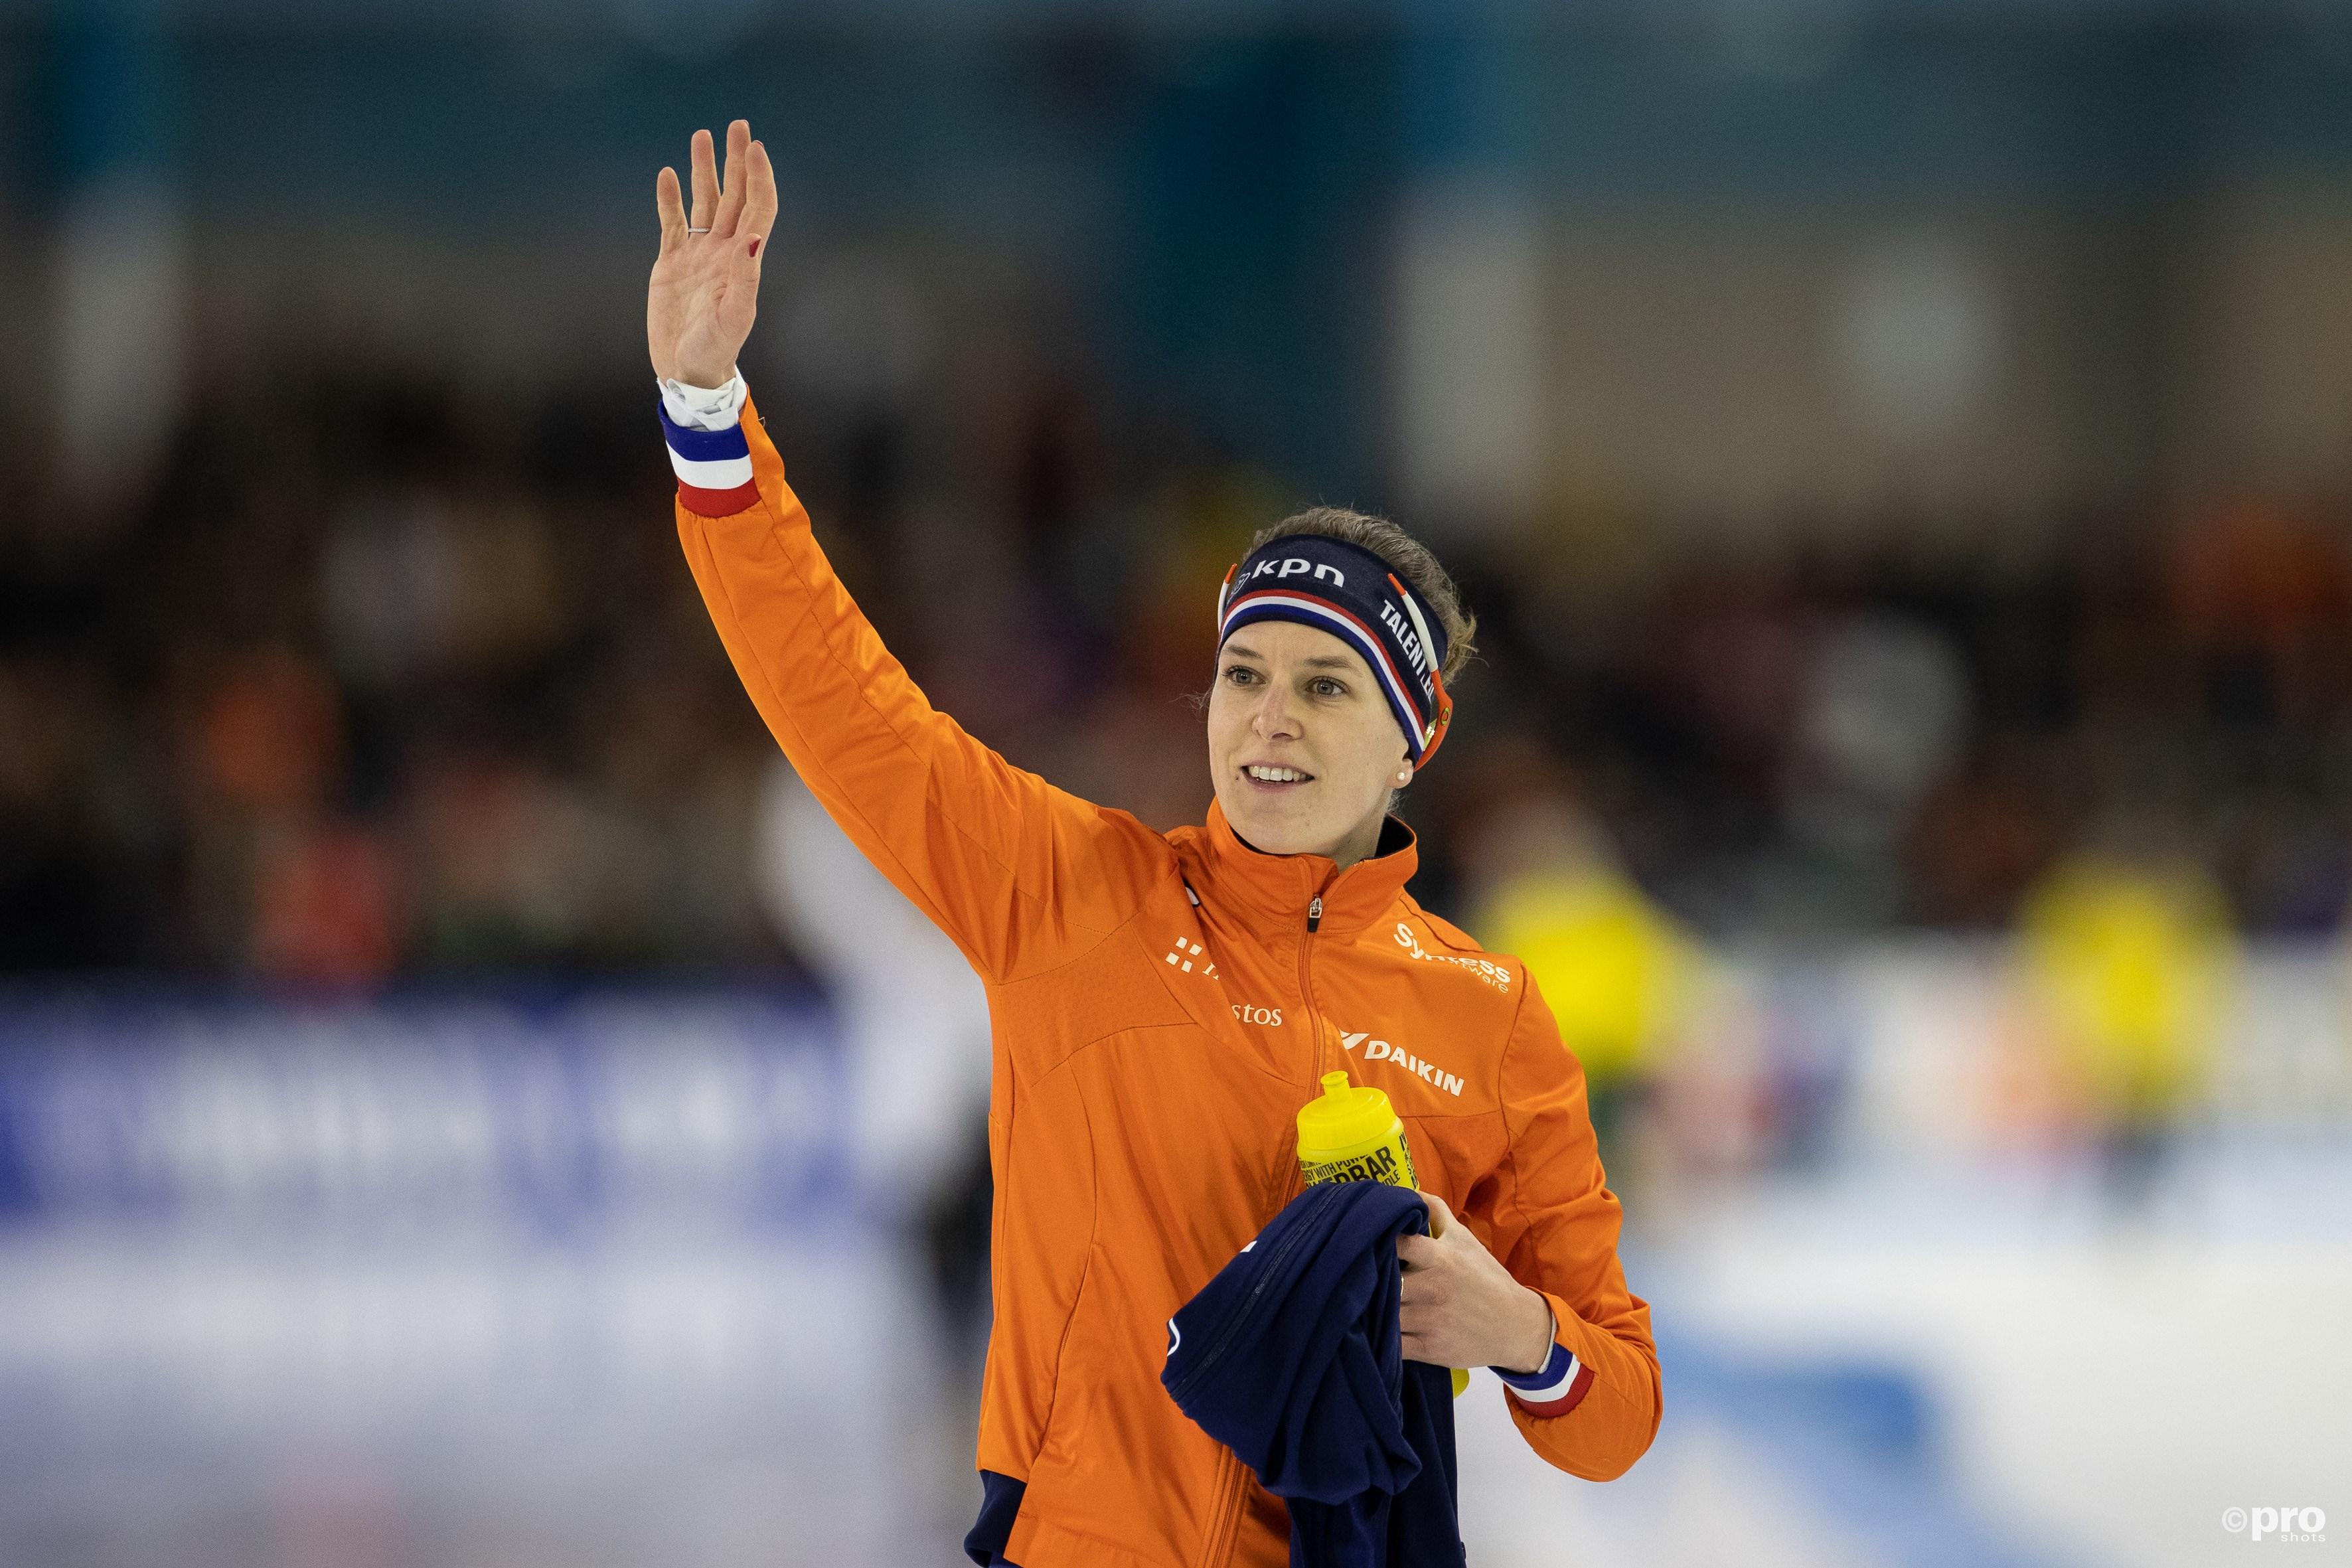 Wüst wint wereldbeker op de 1500 meter. (PRO SHOTS/Ron Baltus)